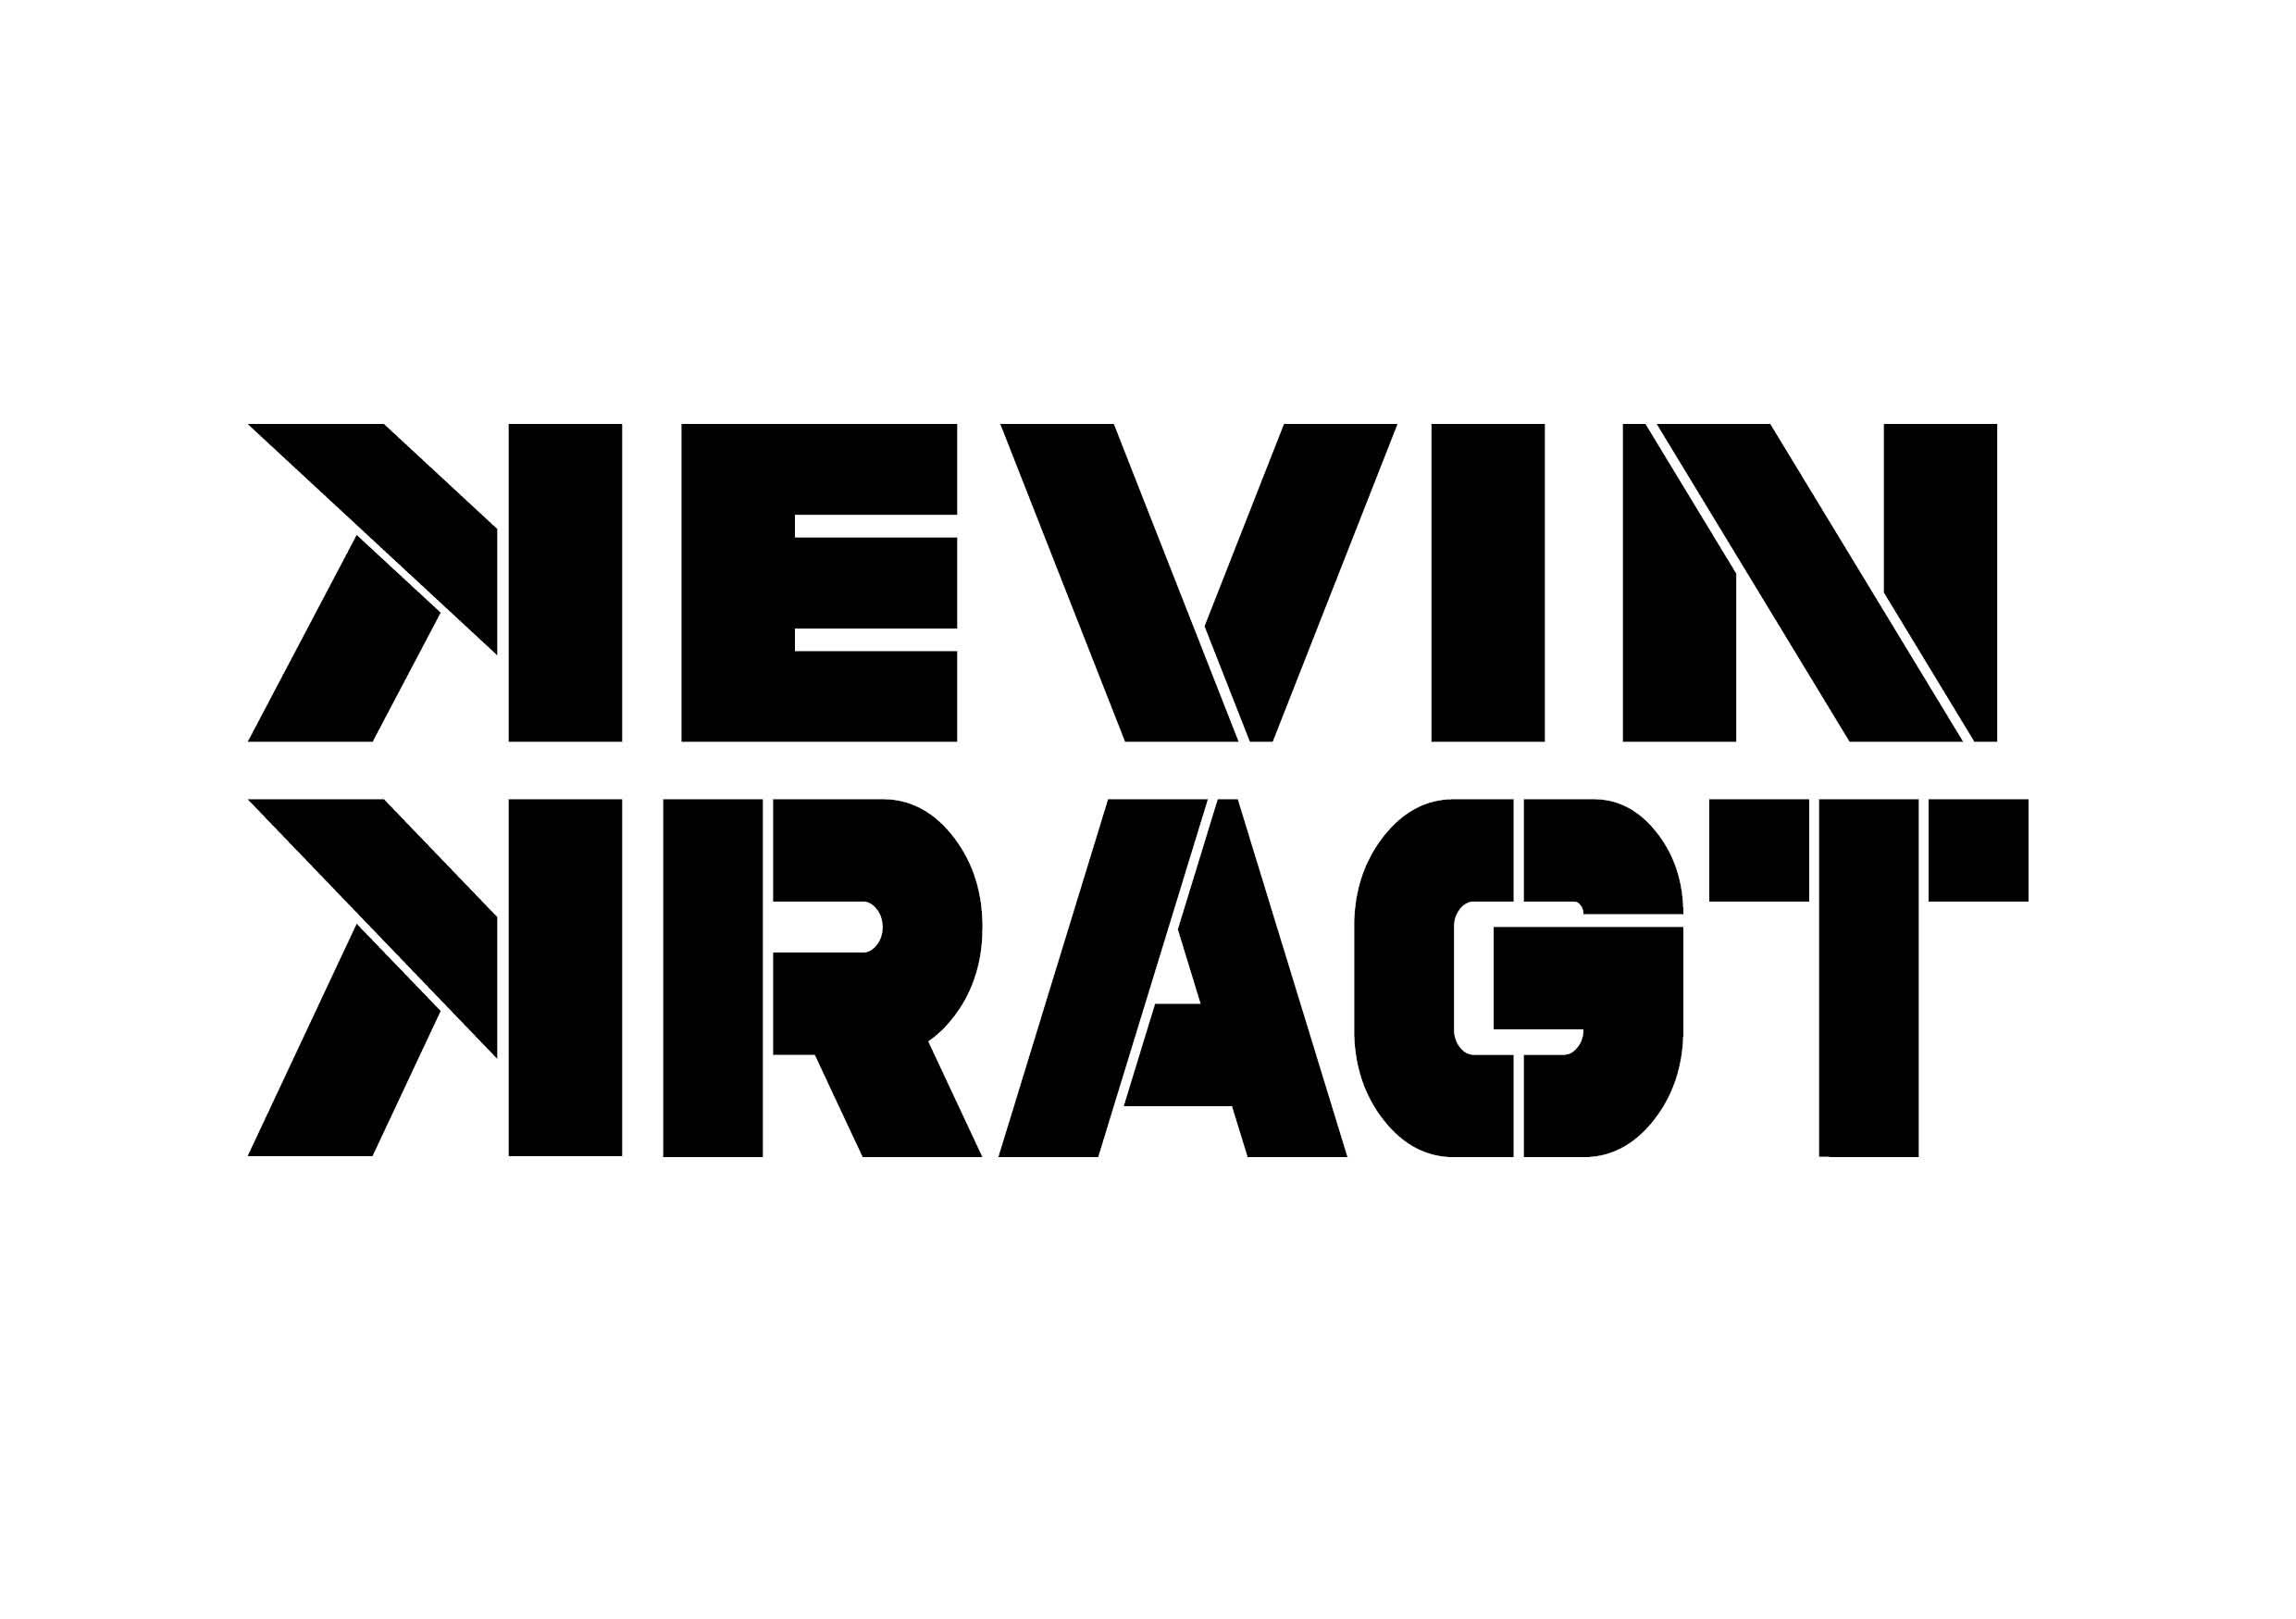 logo Bureau Taz Kevin Kragt